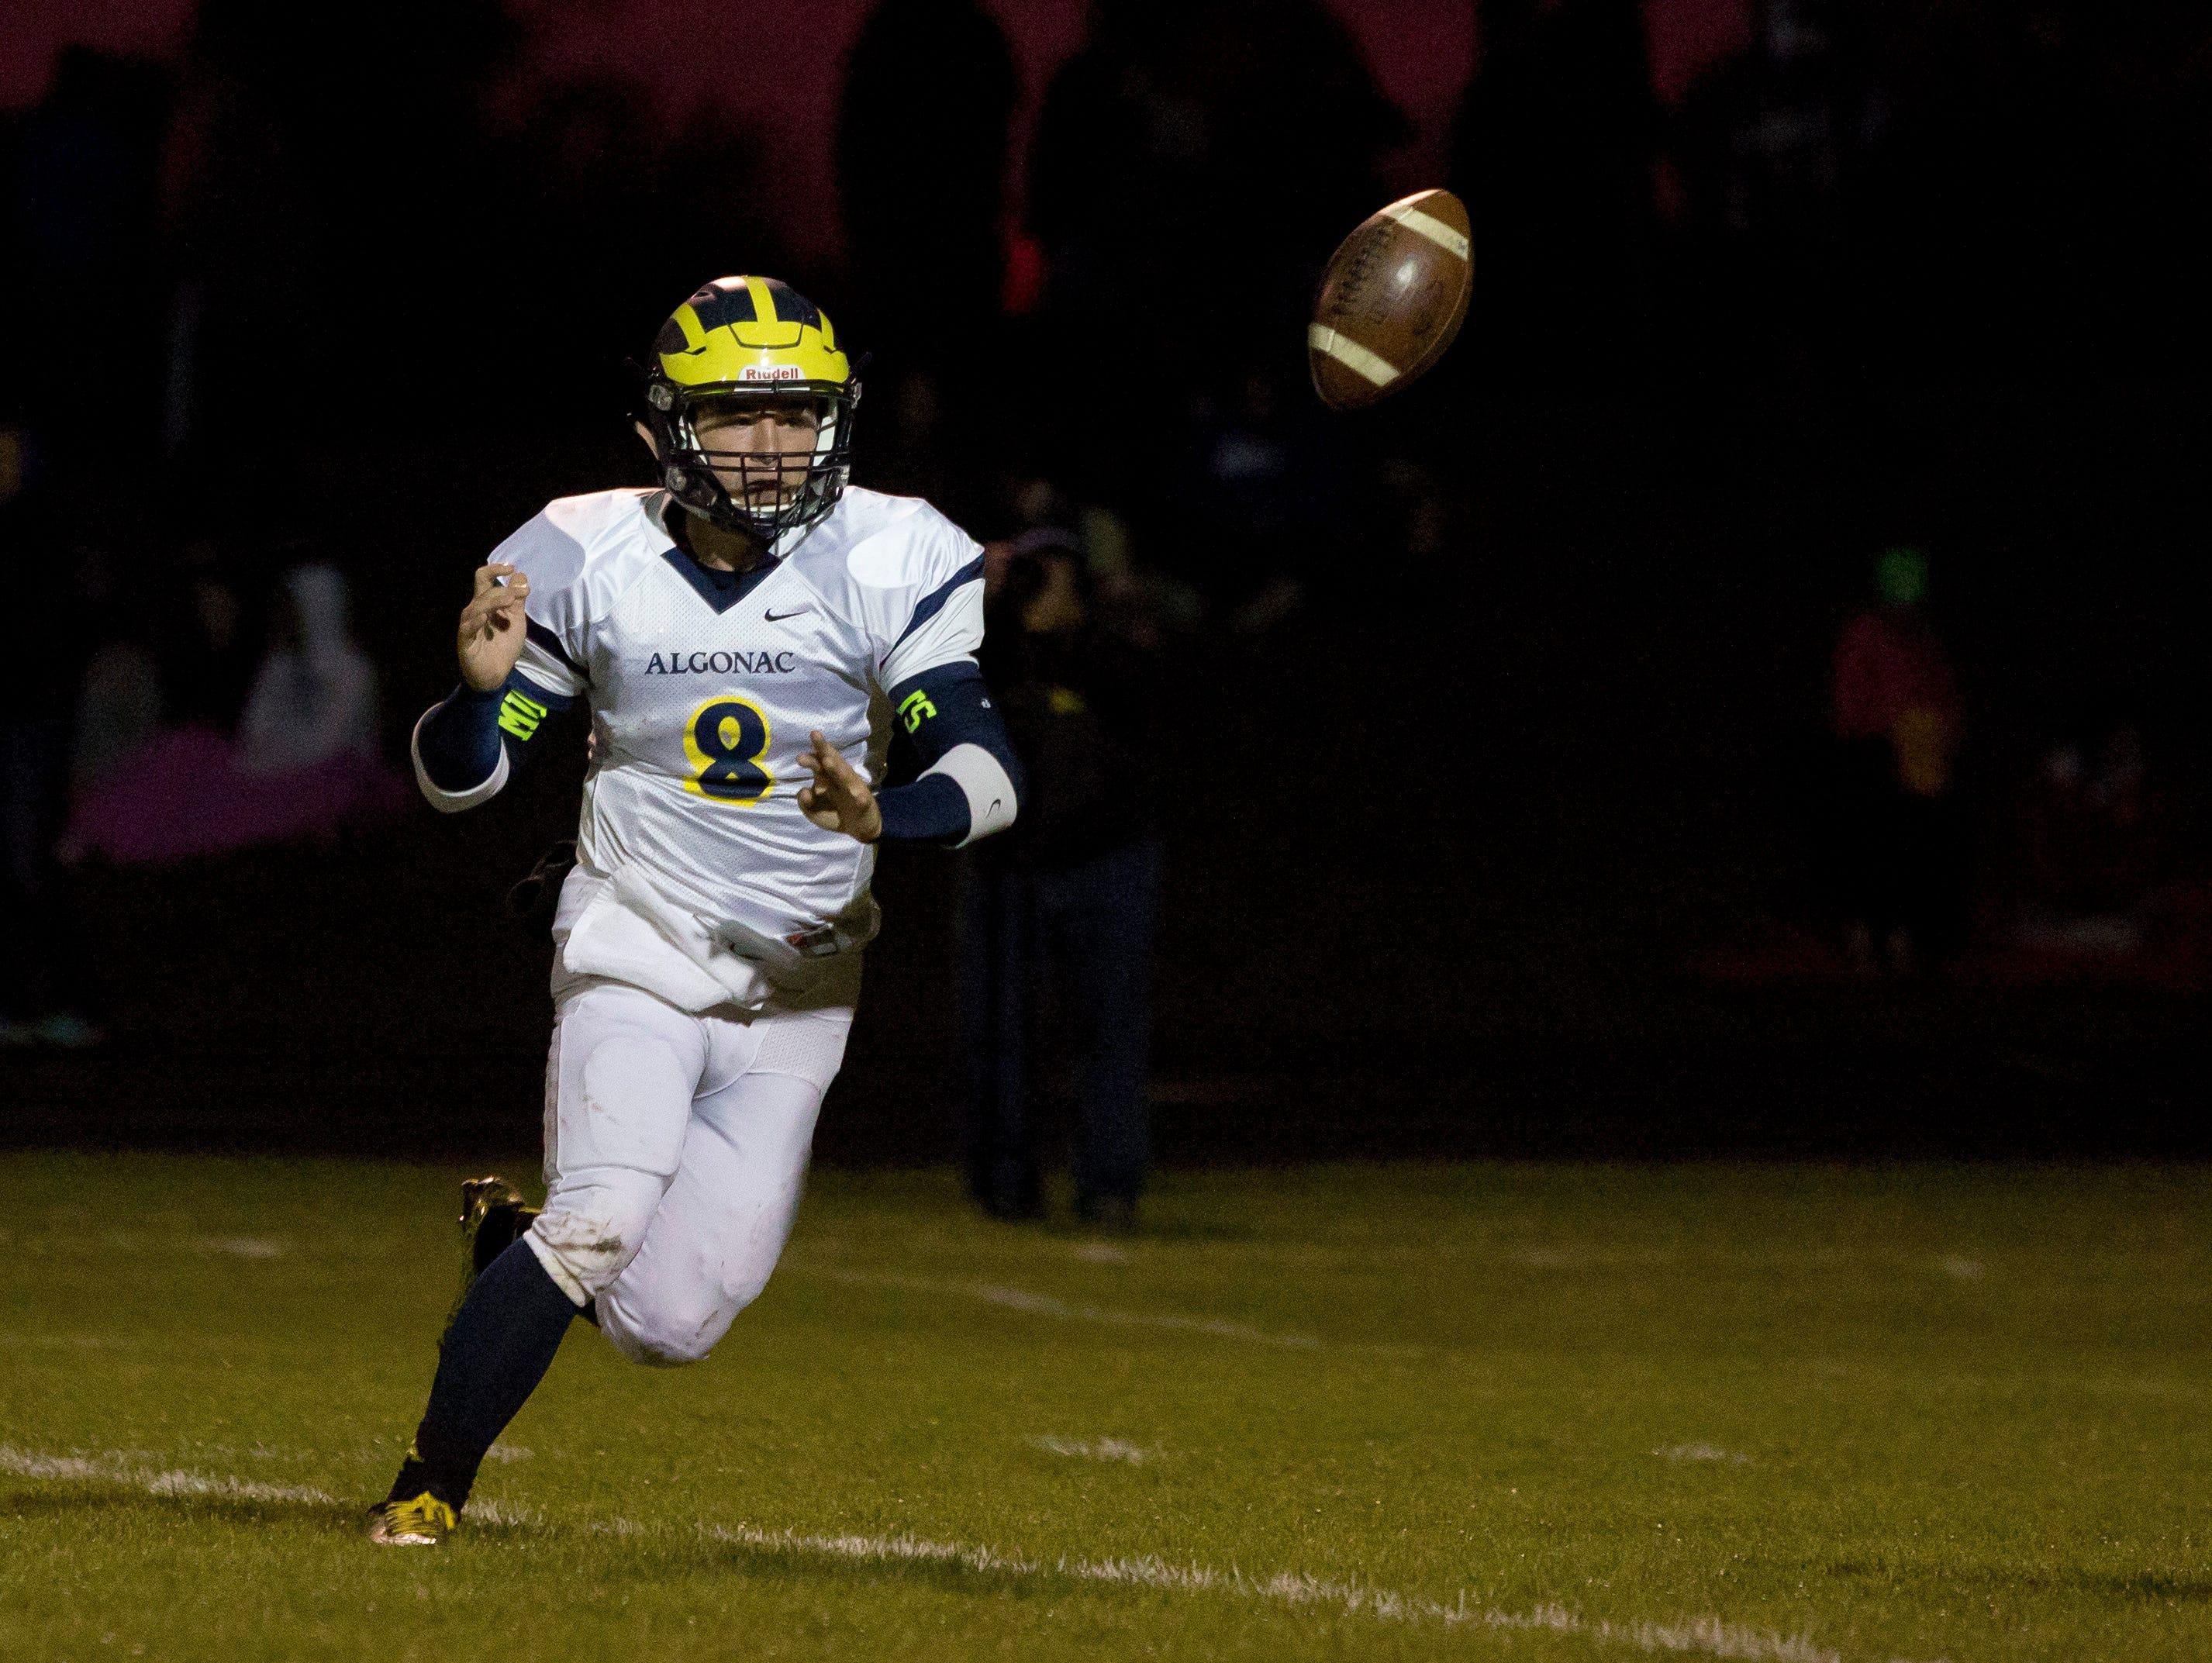 Algonac's AJ Garshott tosses the ball during a football game Friday, October 2, 2015 at Croswell-Lexington High School.